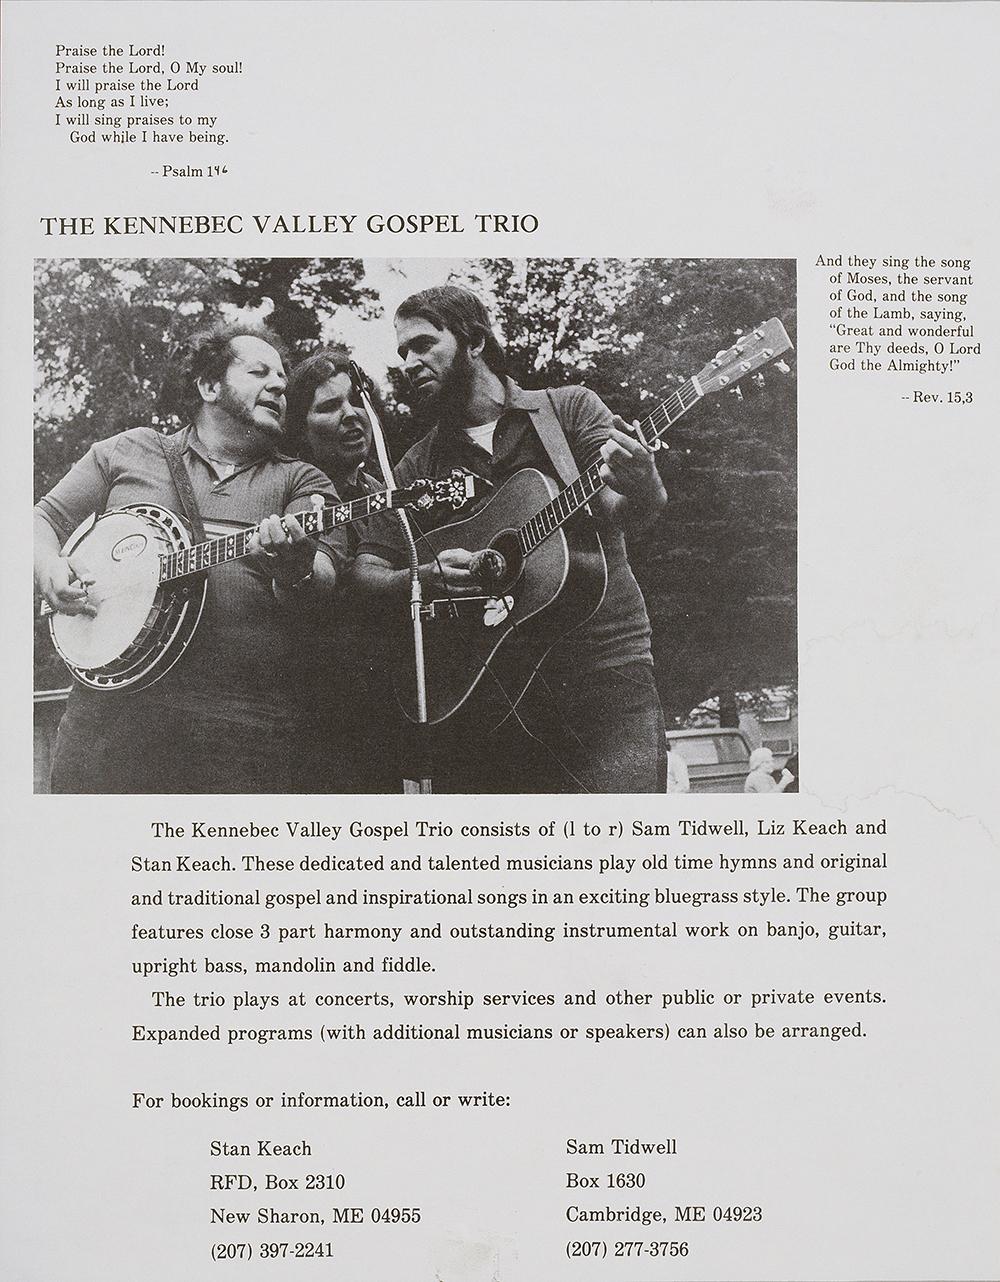 BIOG-0291, The Kennebec Valley Gospel Trio